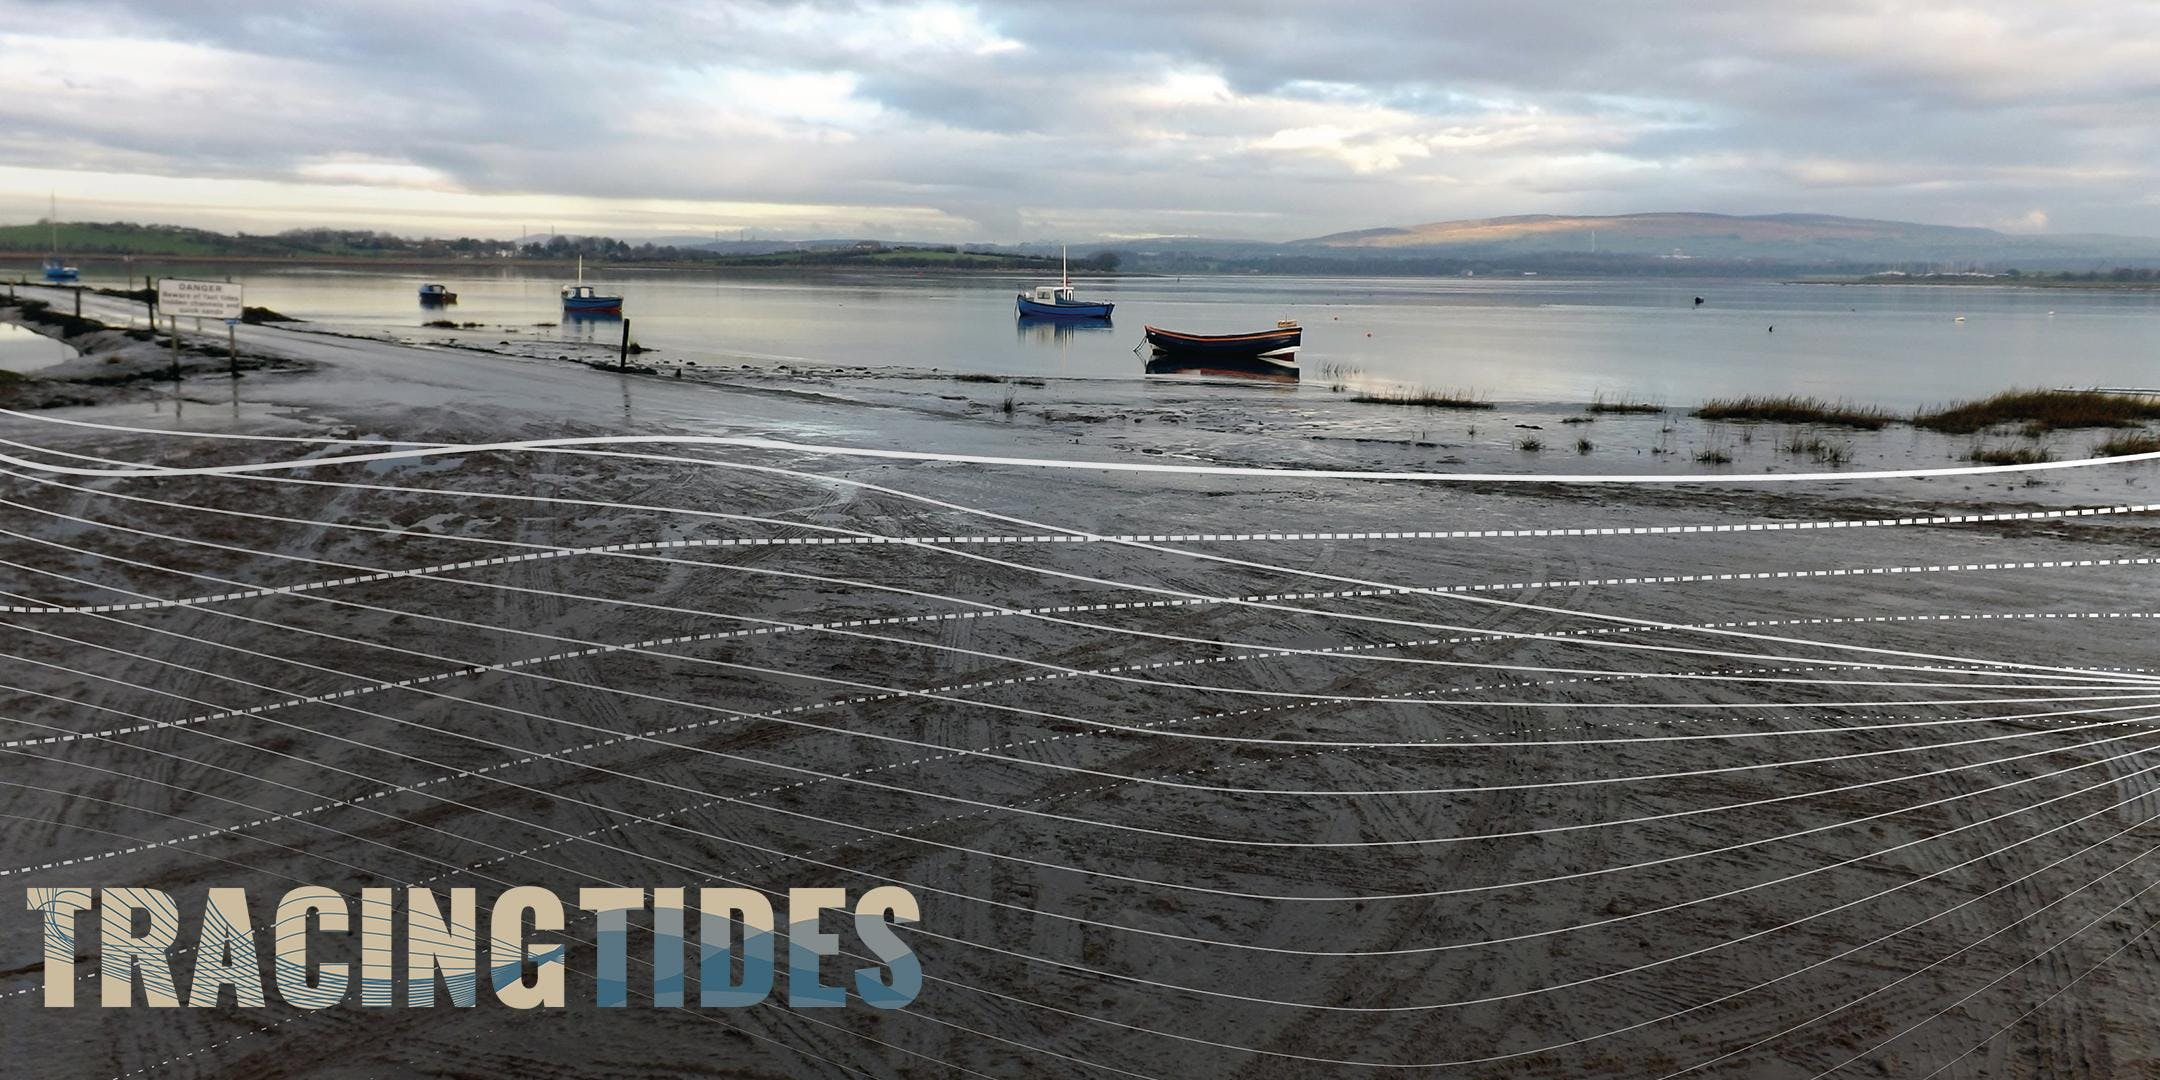 Tracing Tides